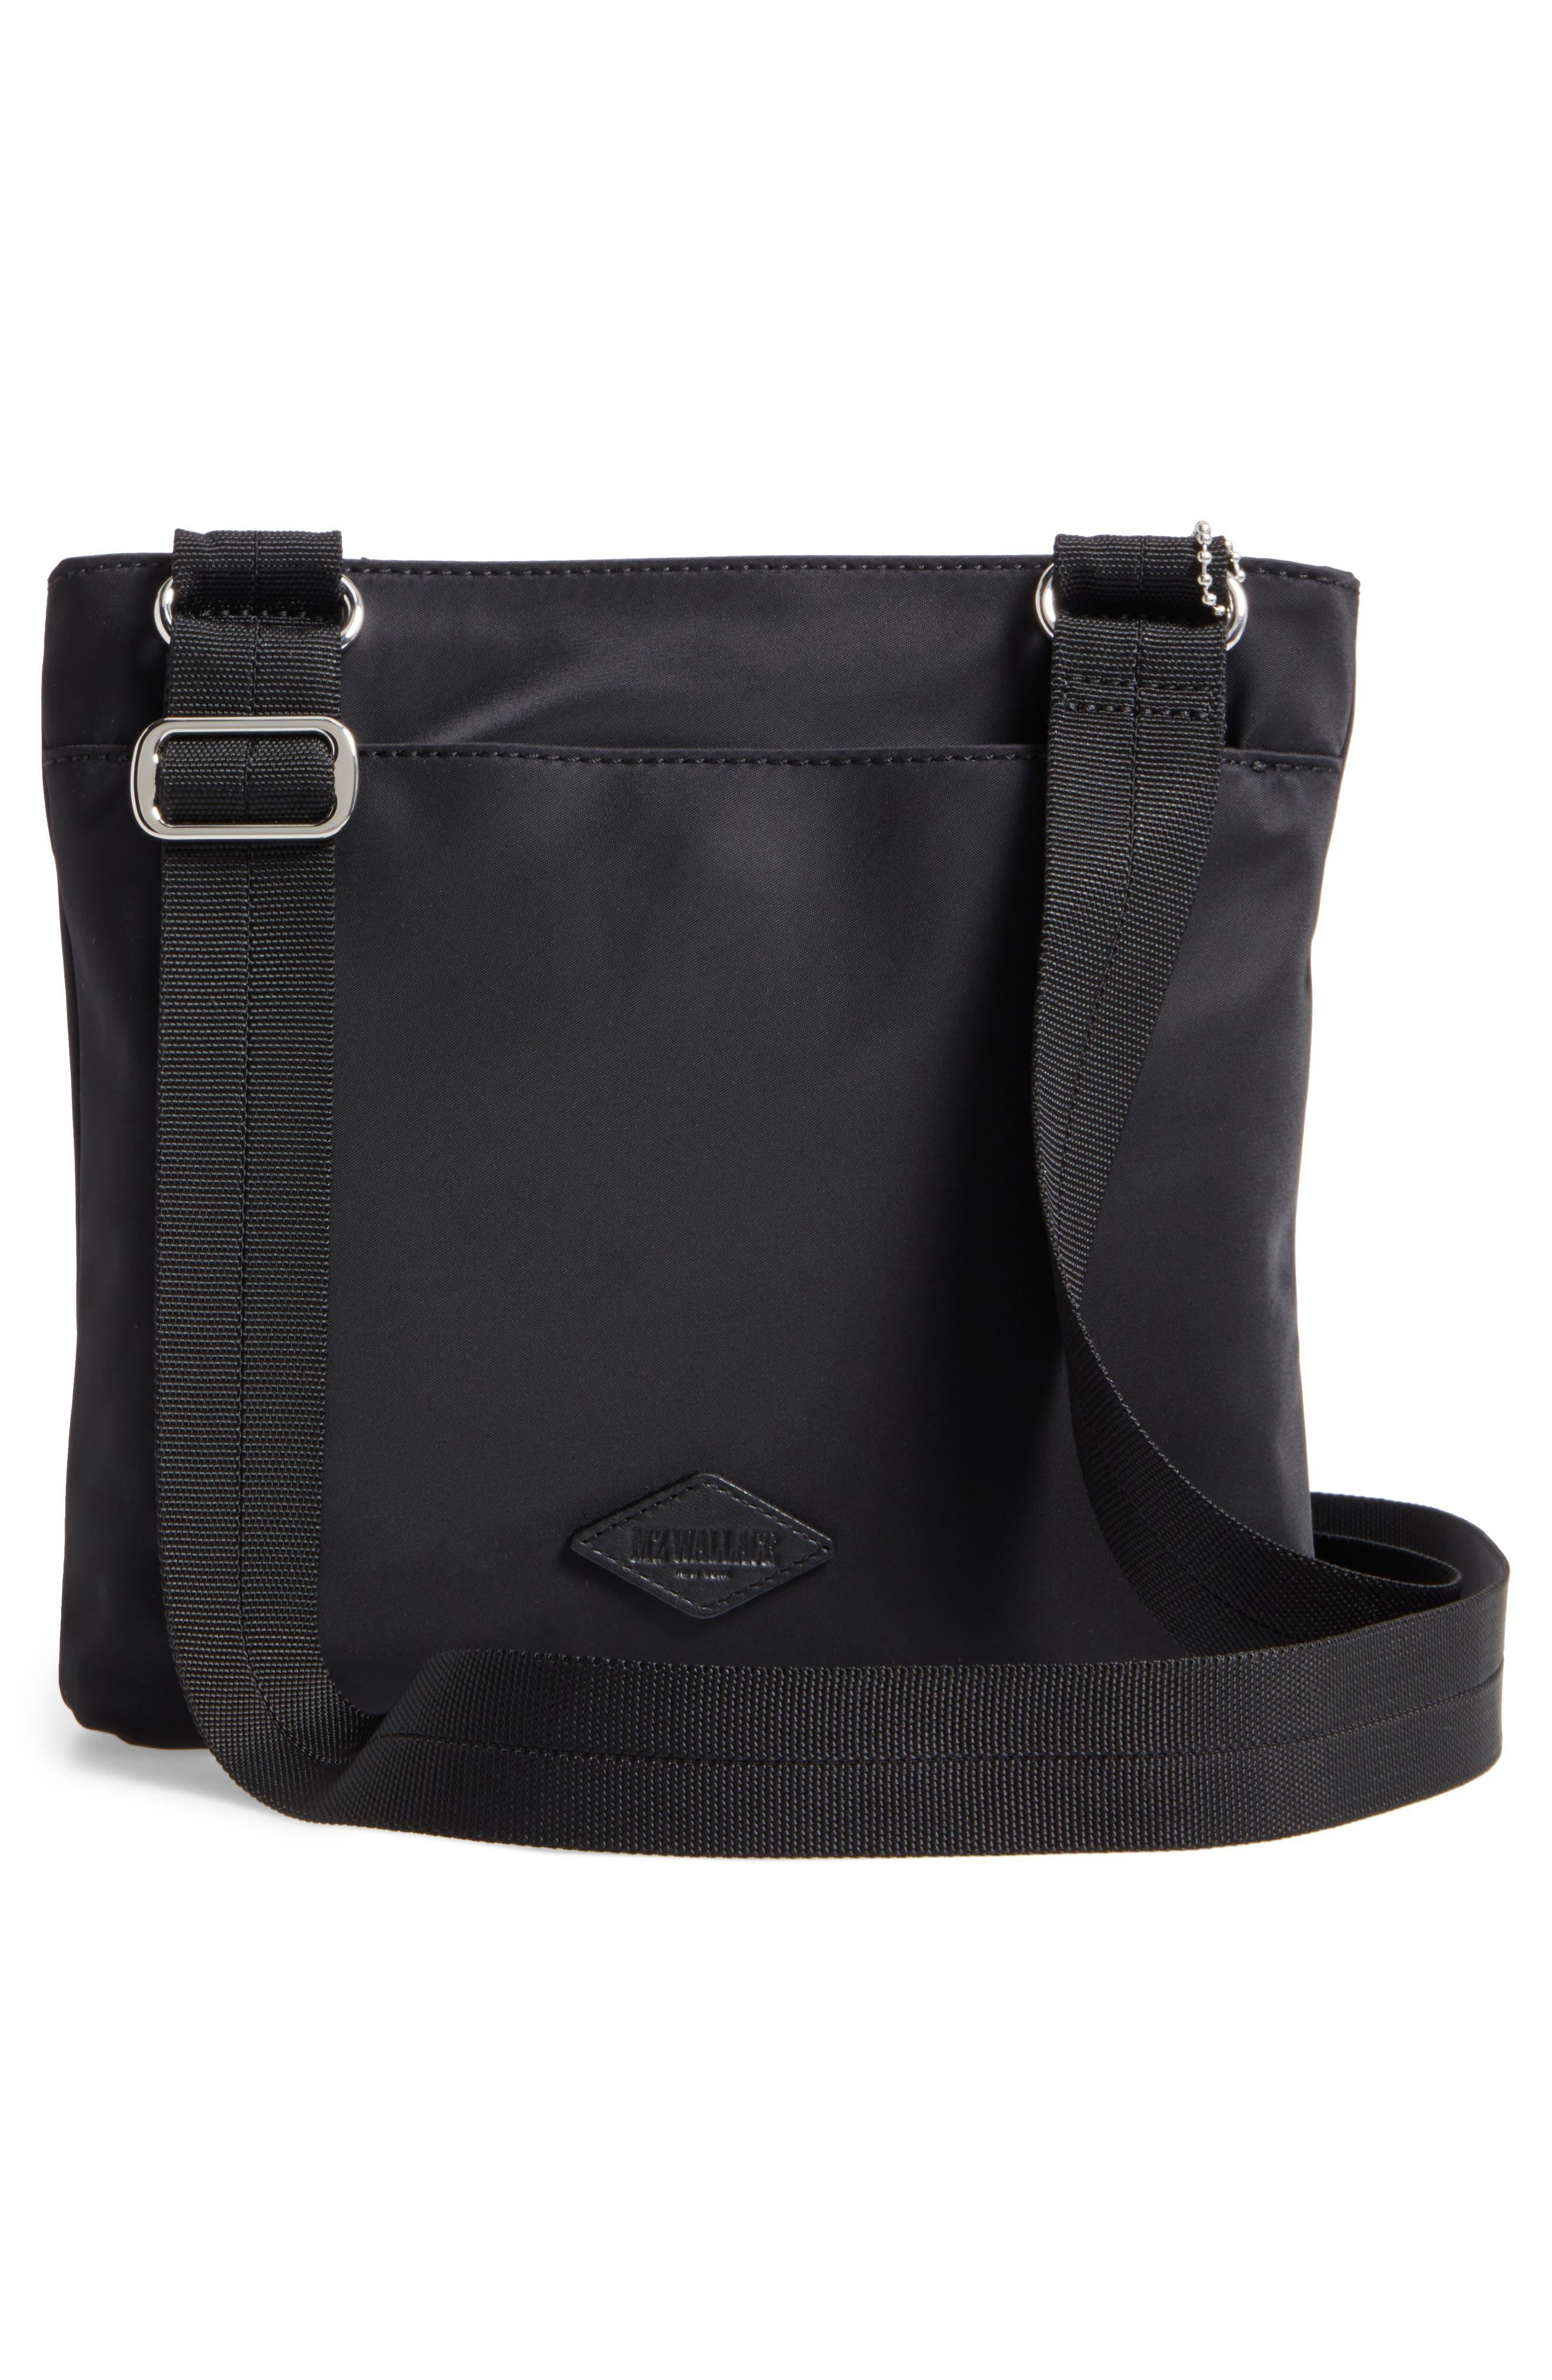 Jordan Bedford Nylon Crossbody Bag,                             Alternate thumbnail 3, color,                             008